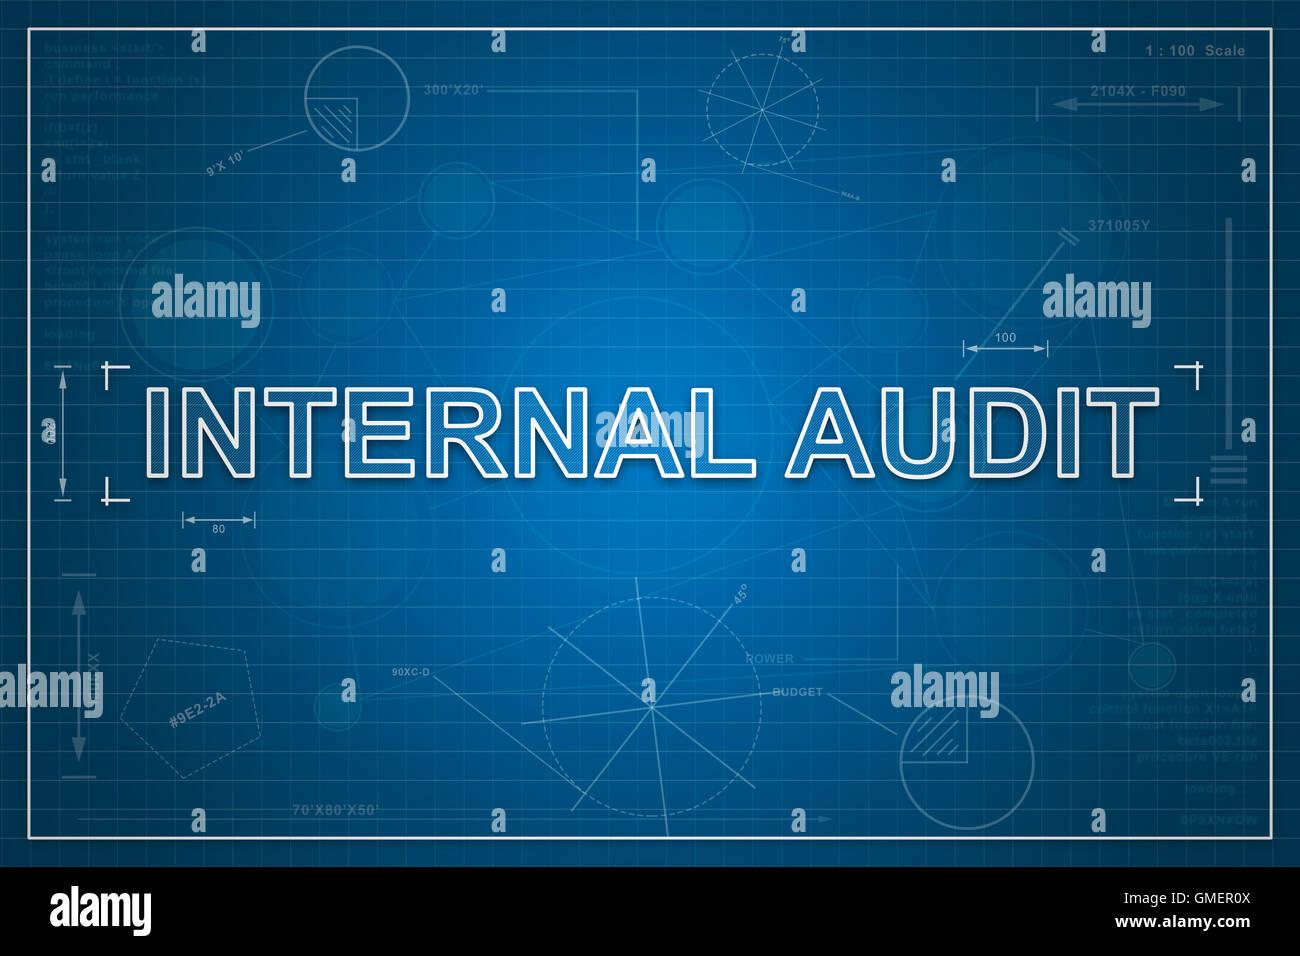 Internal audit on paper blueprint background business concept internal audit on paper blueprint background business concept malvernweather Images